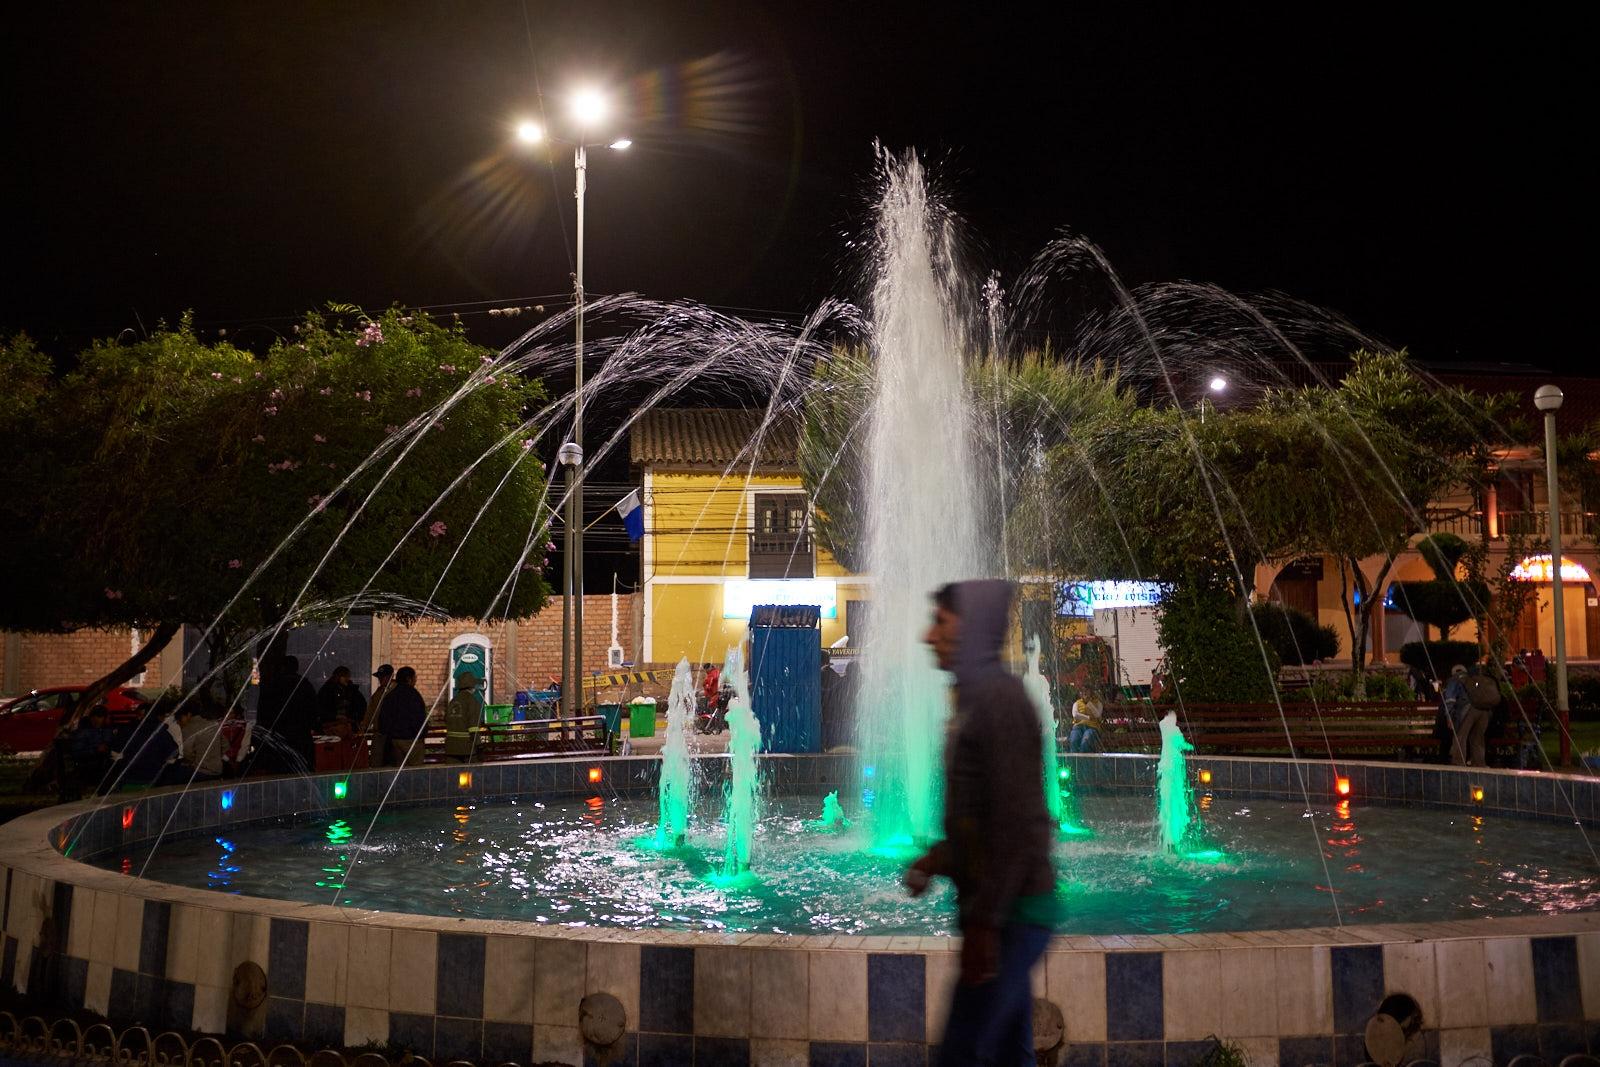 Man and fountain, Plaza de Armas, Calca, Peru.